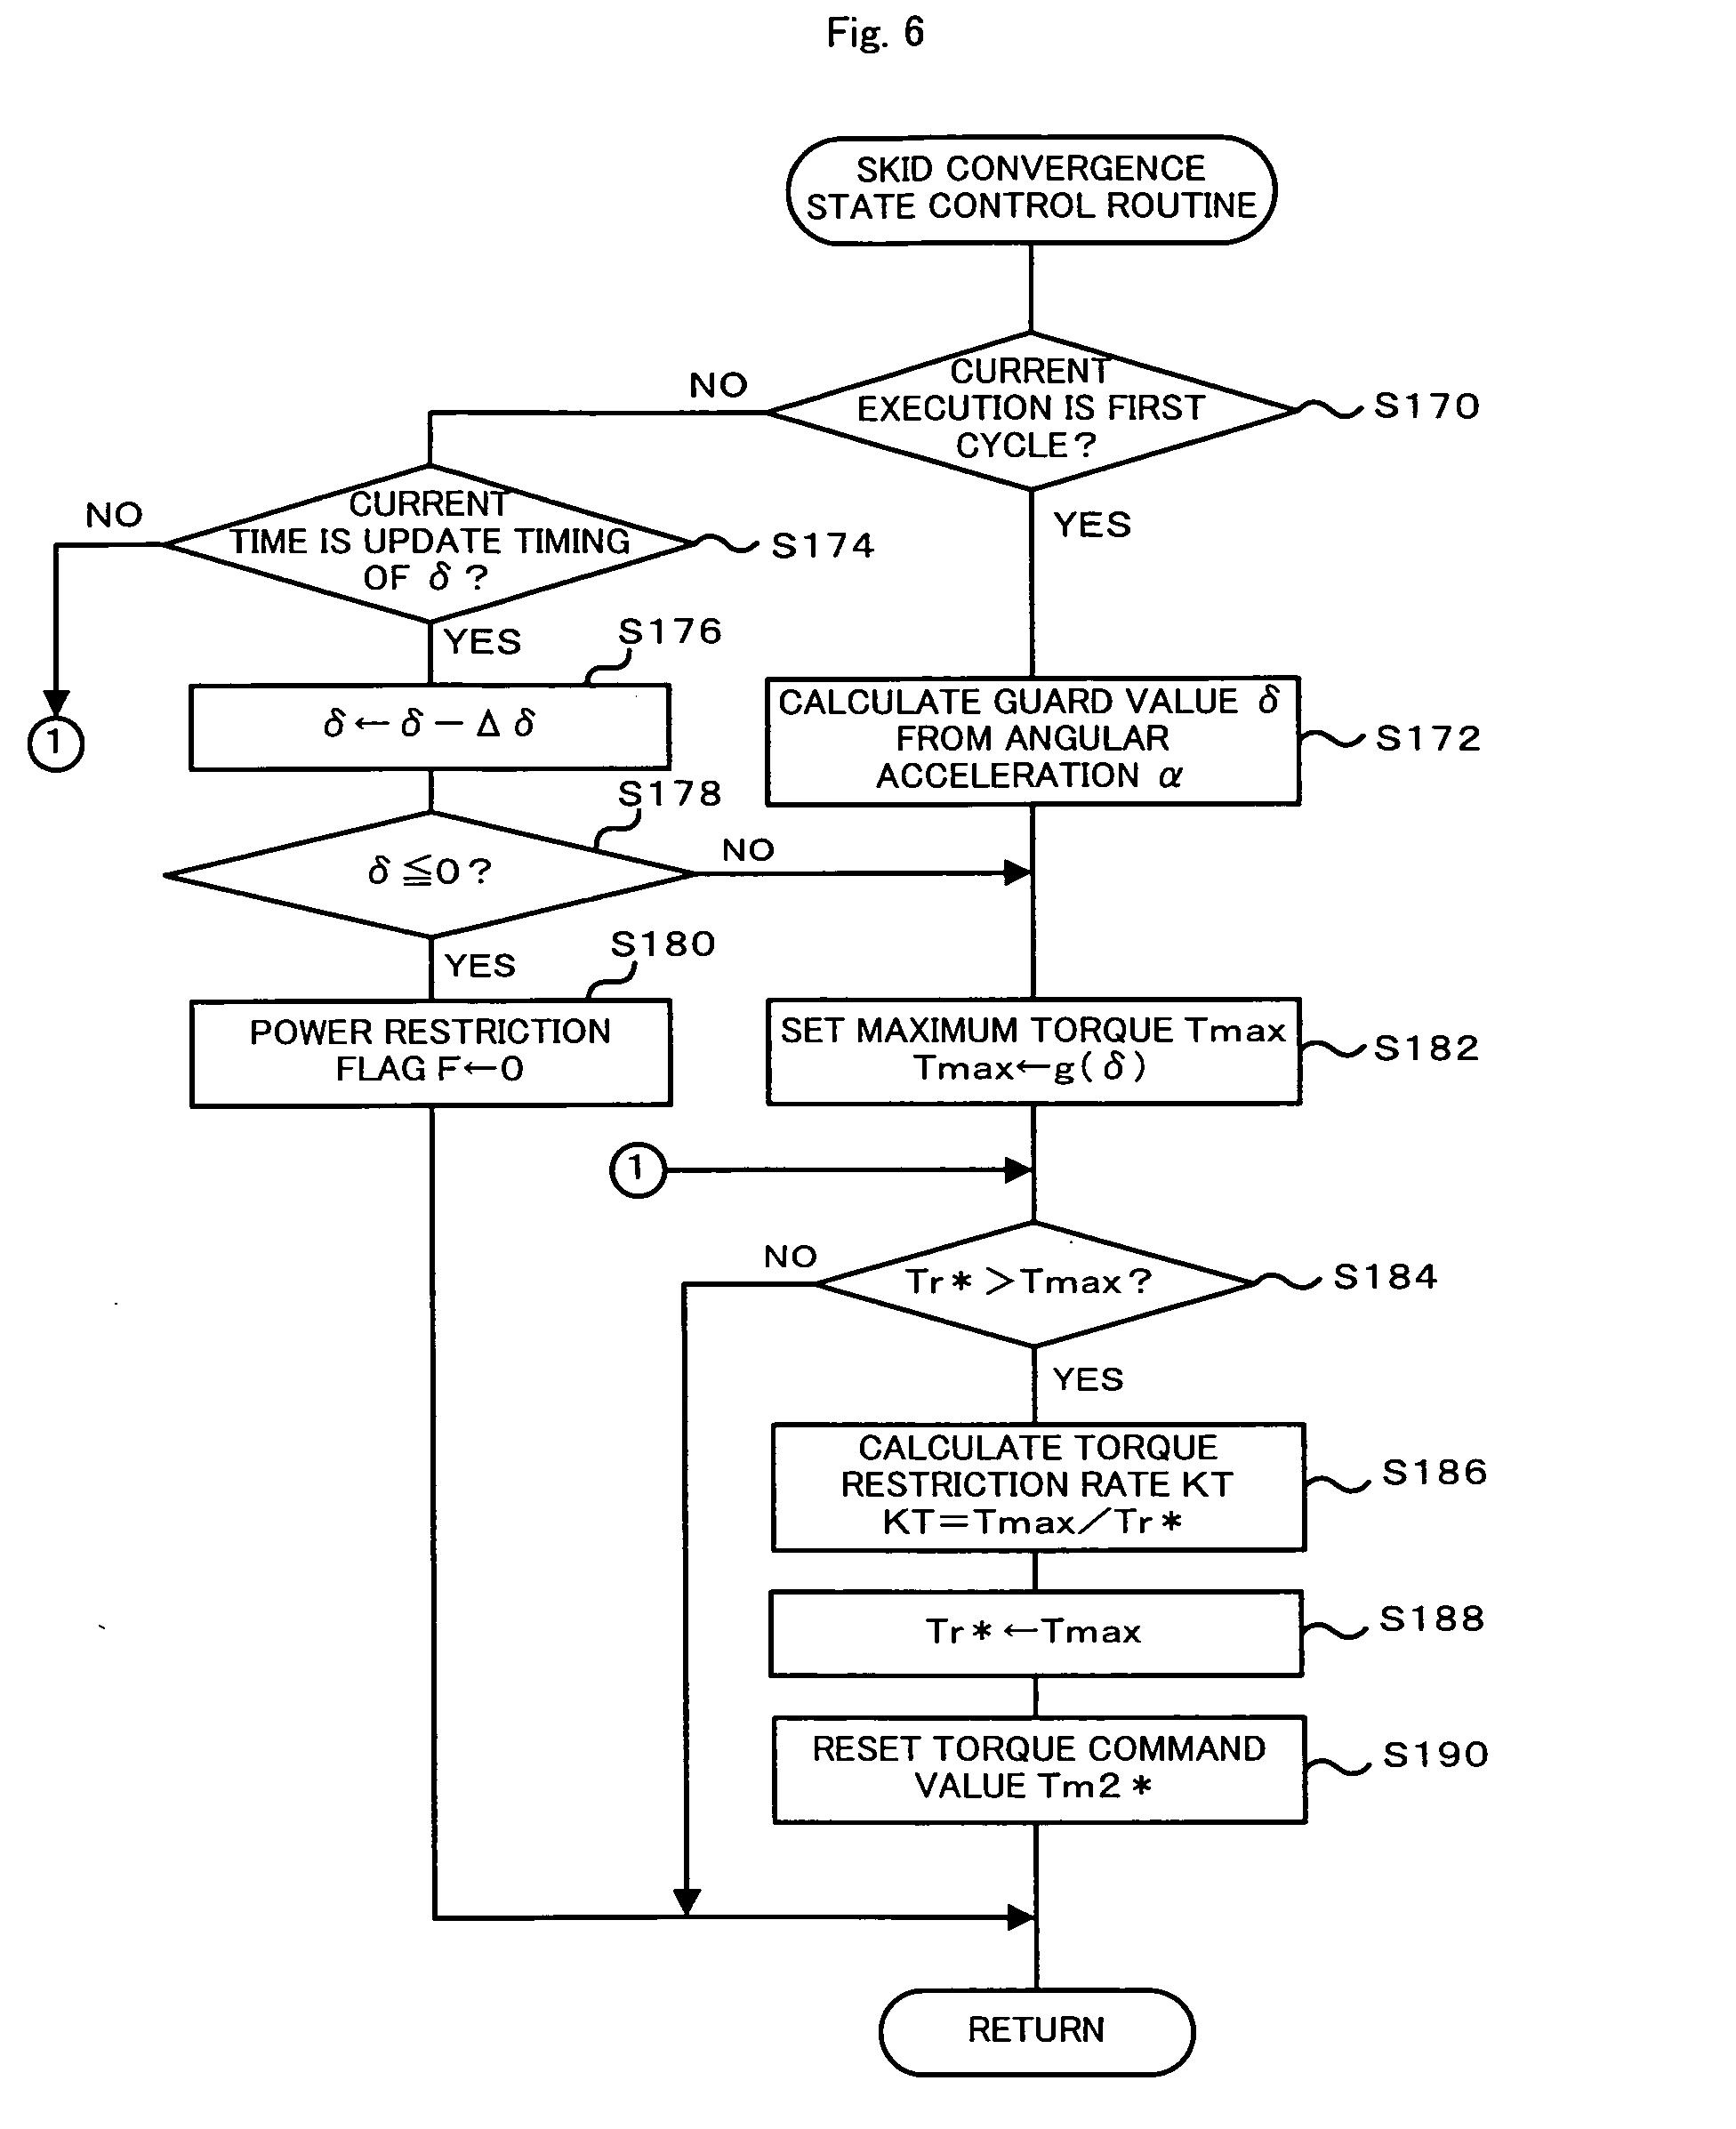 专利ep1548253a1 - dispositif